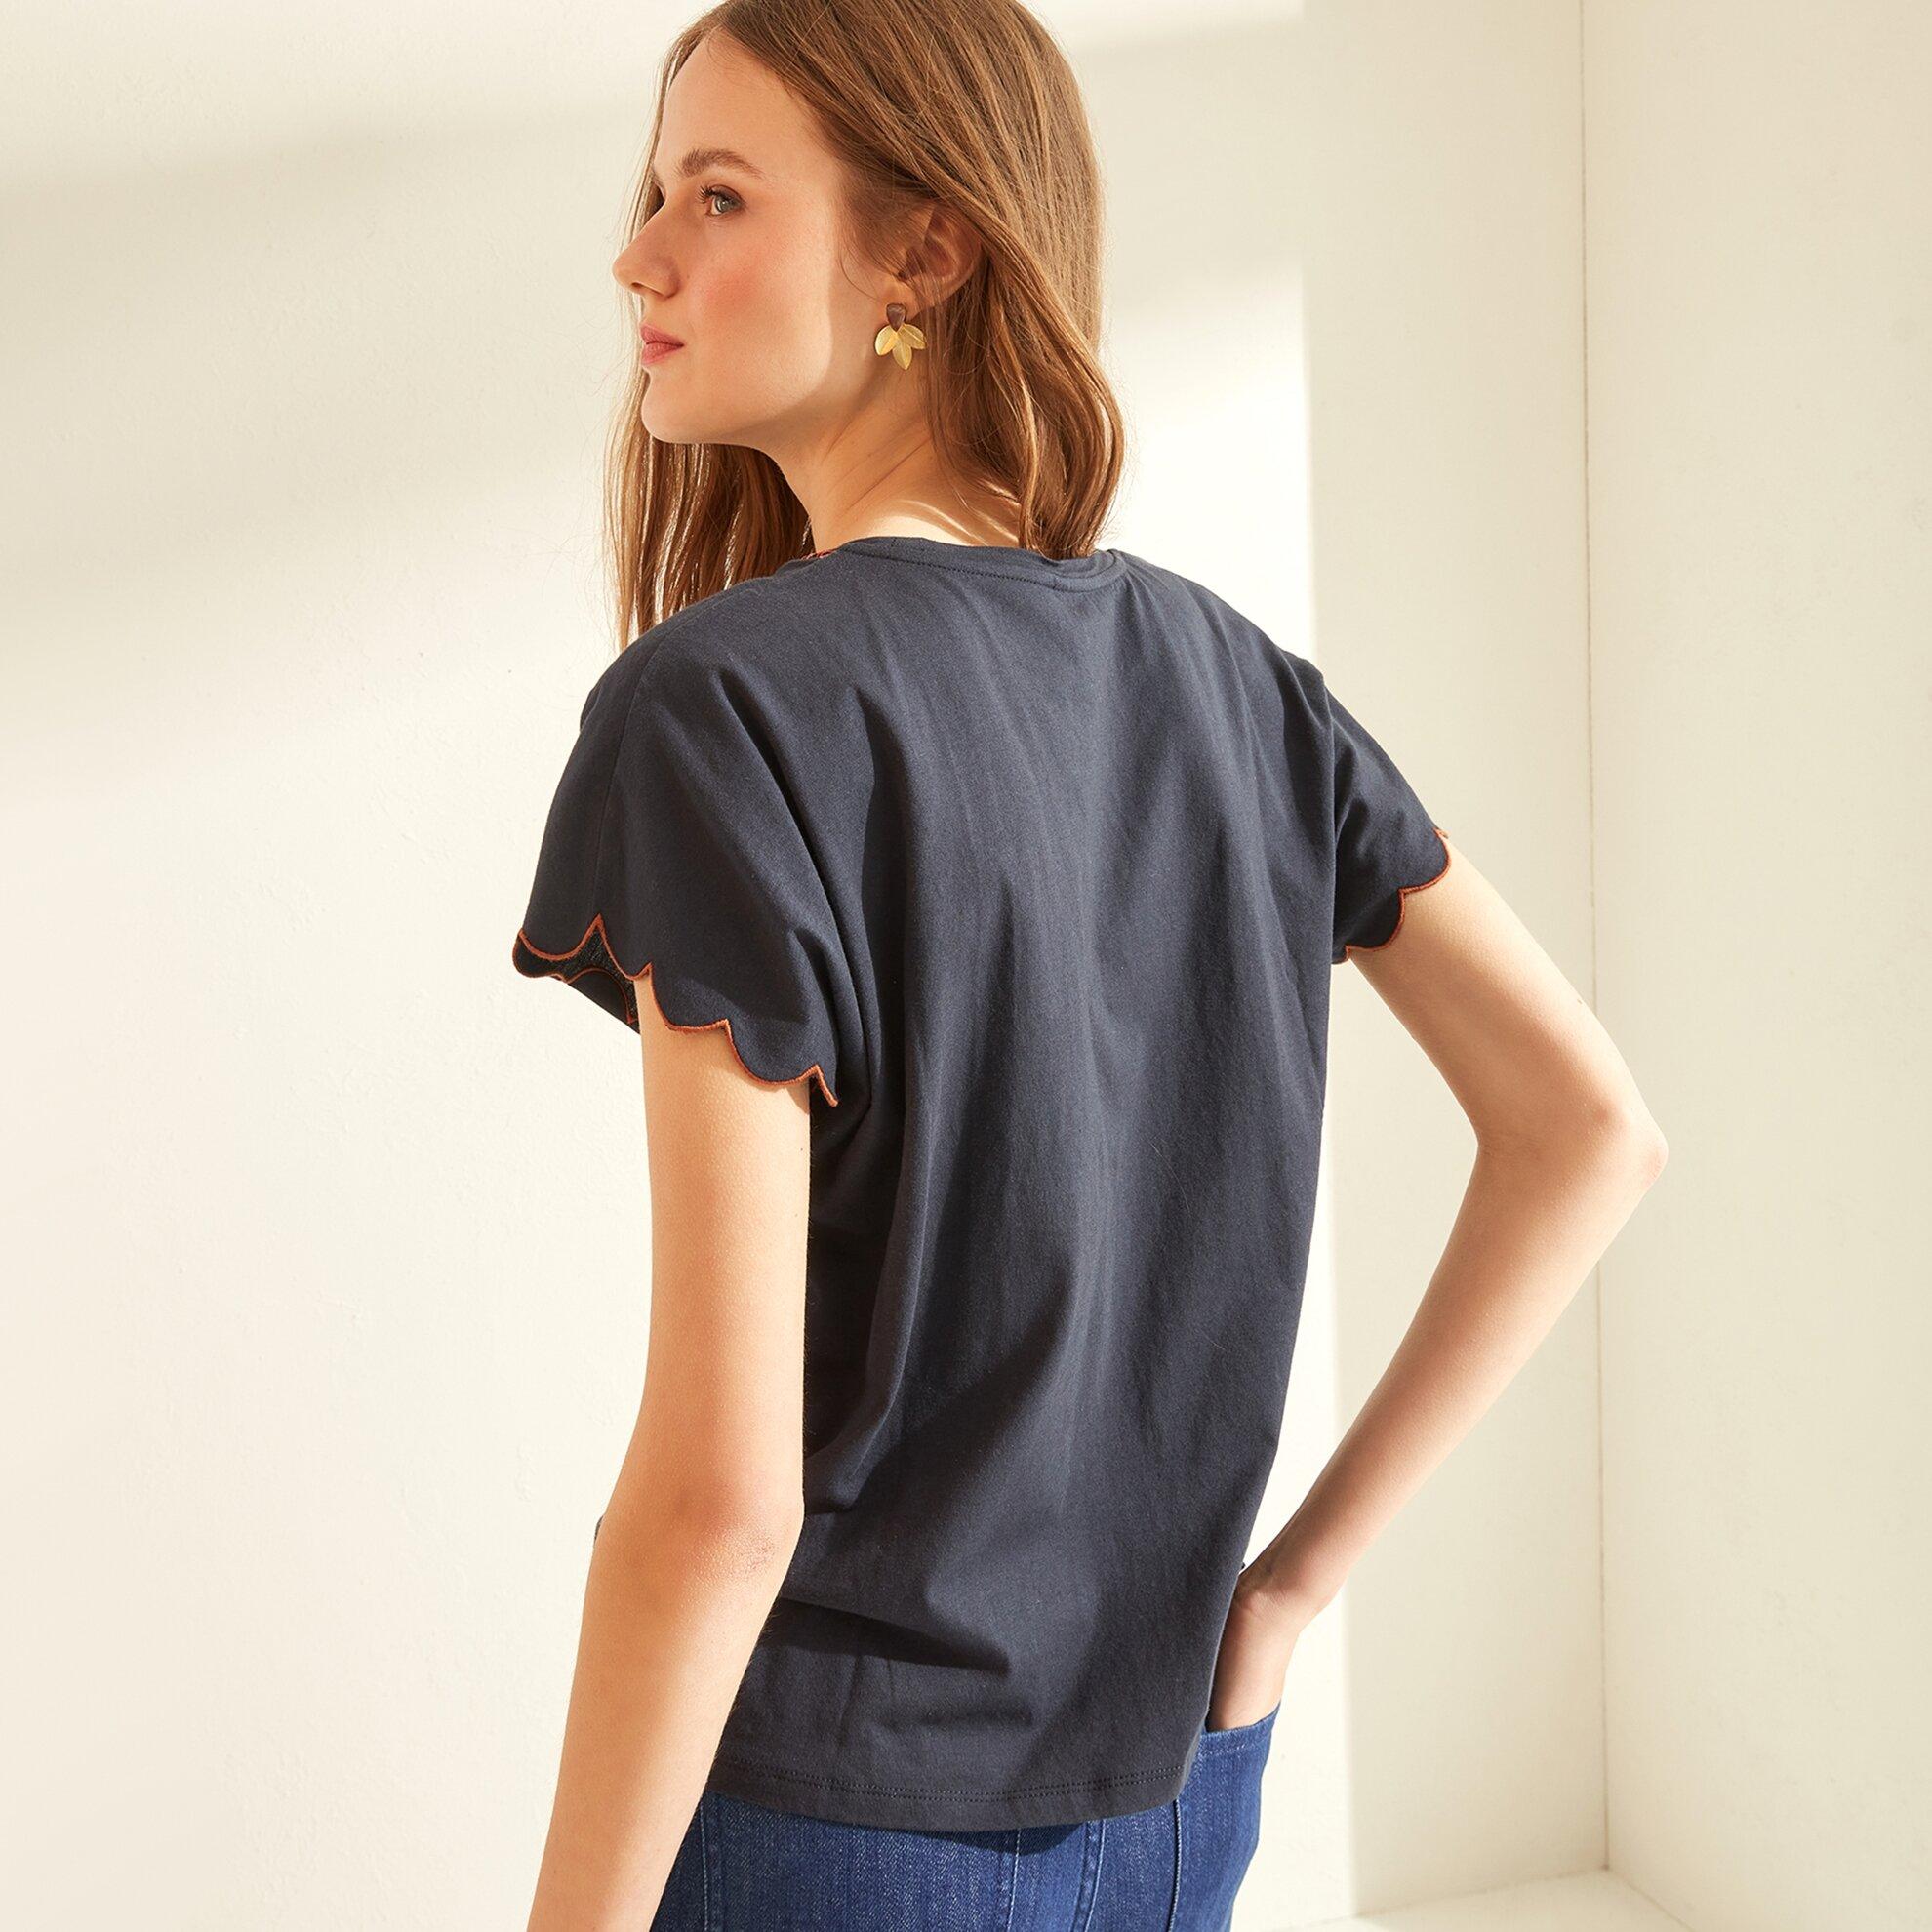 Merdiven Biyeli T-Shirt